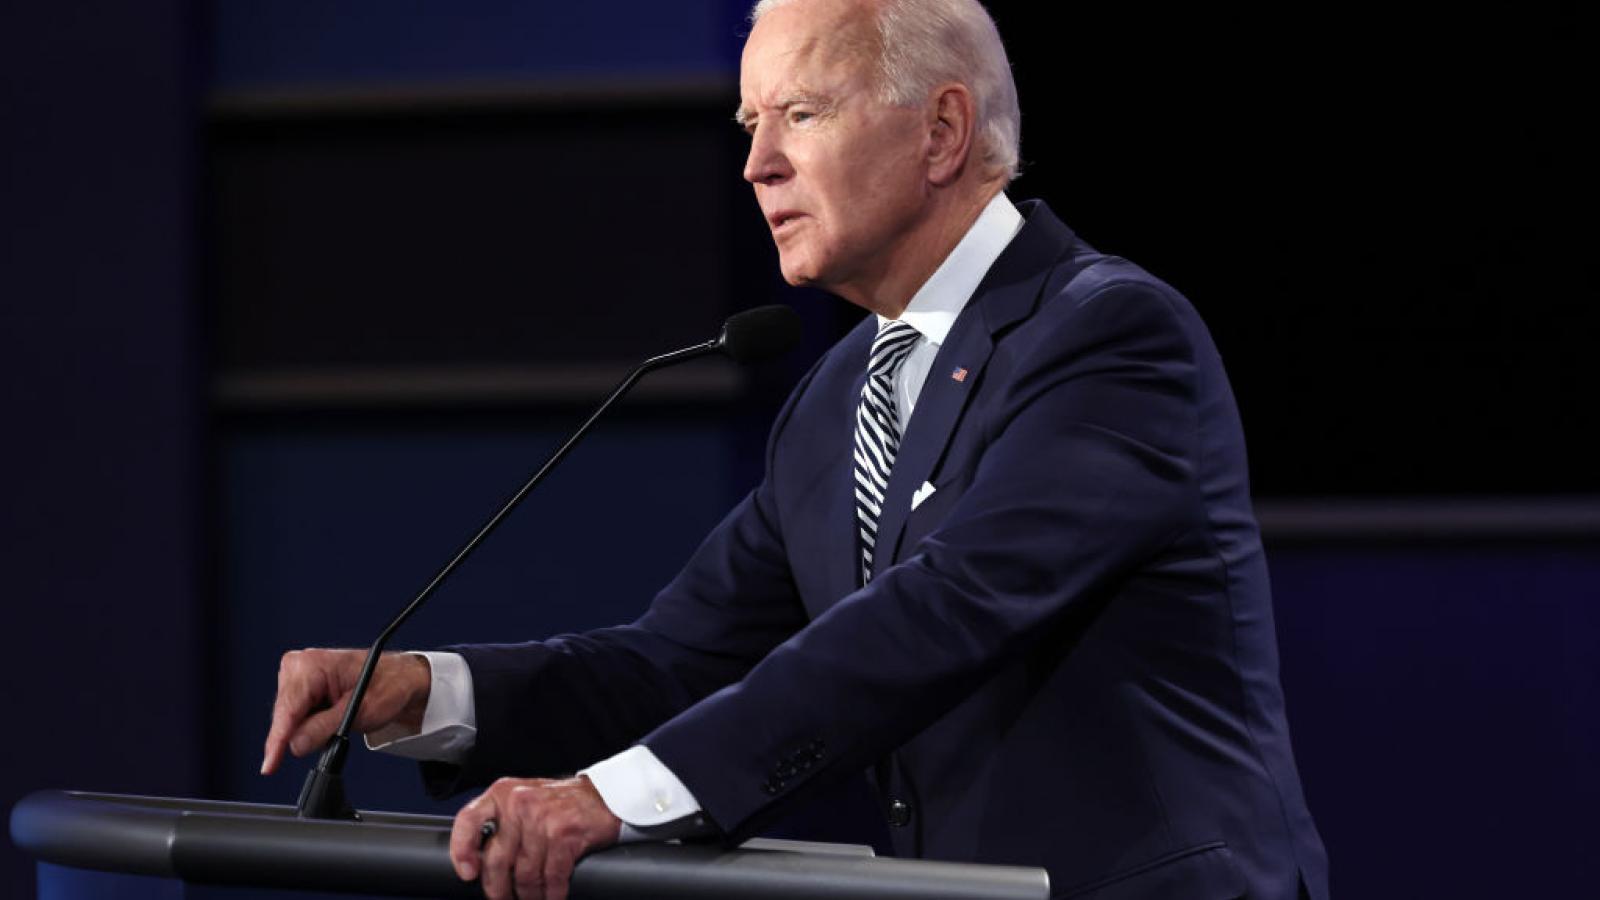 Biden at the first debate